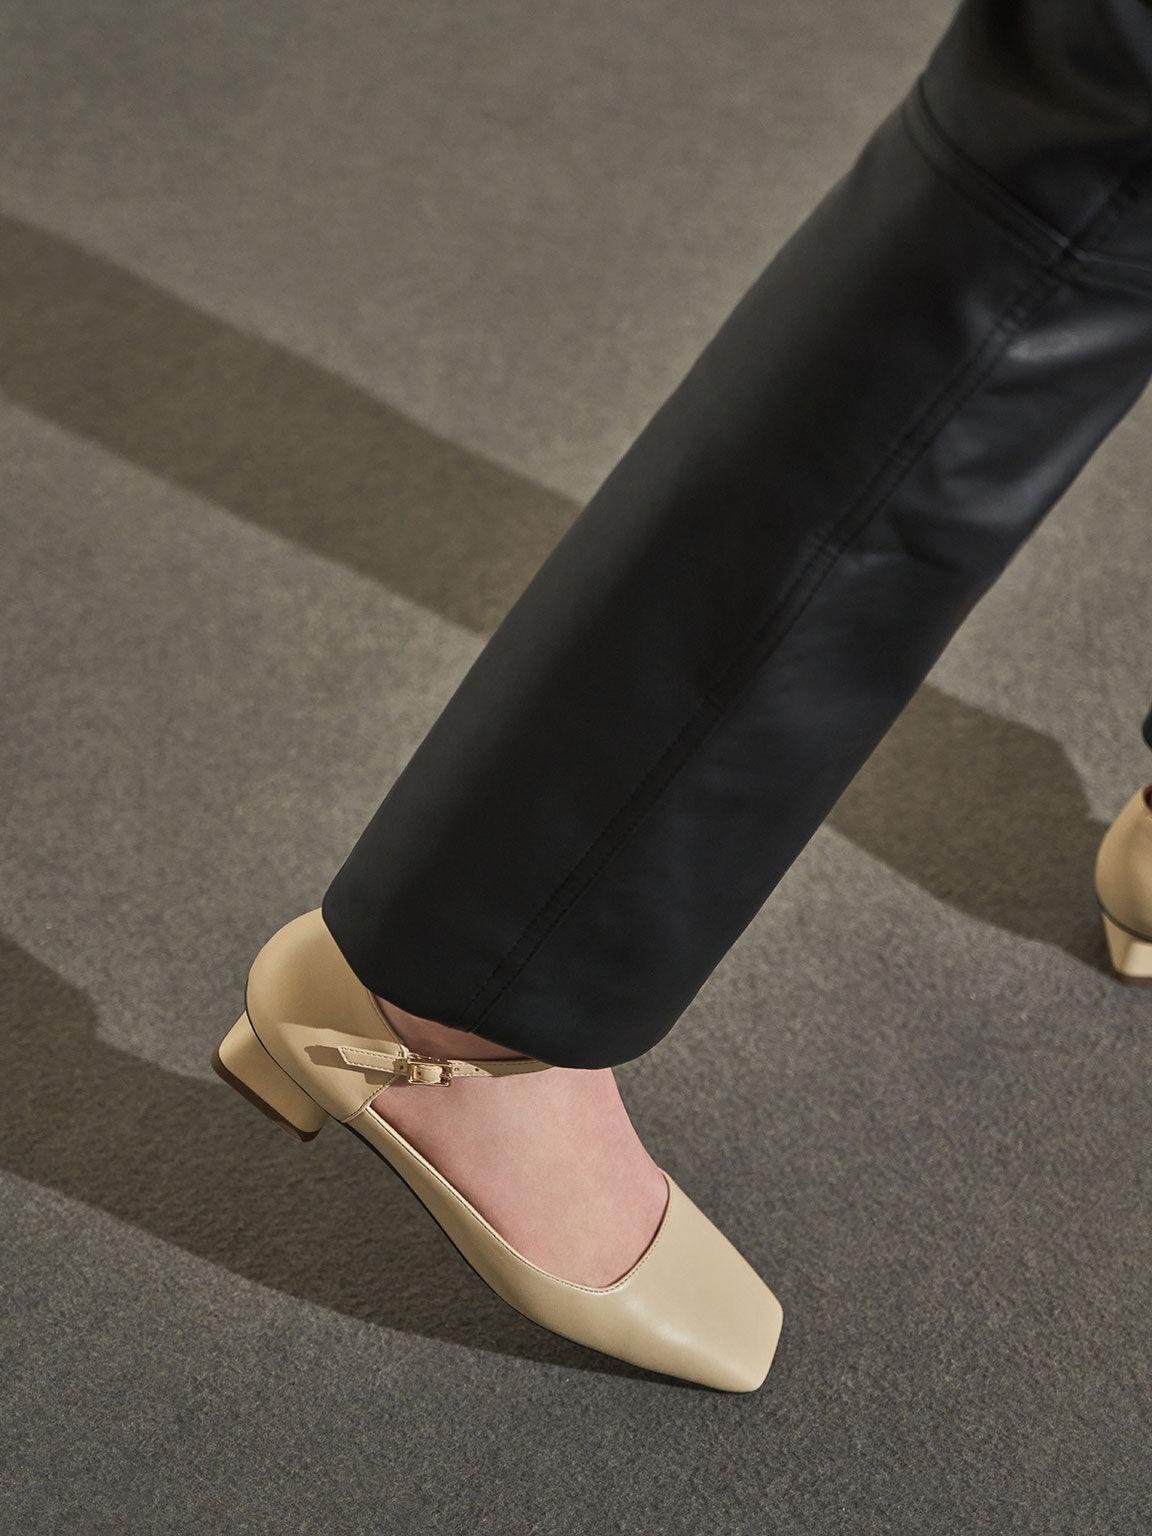 Square Toe Ankle Strap Pumps, Beige, hi-res